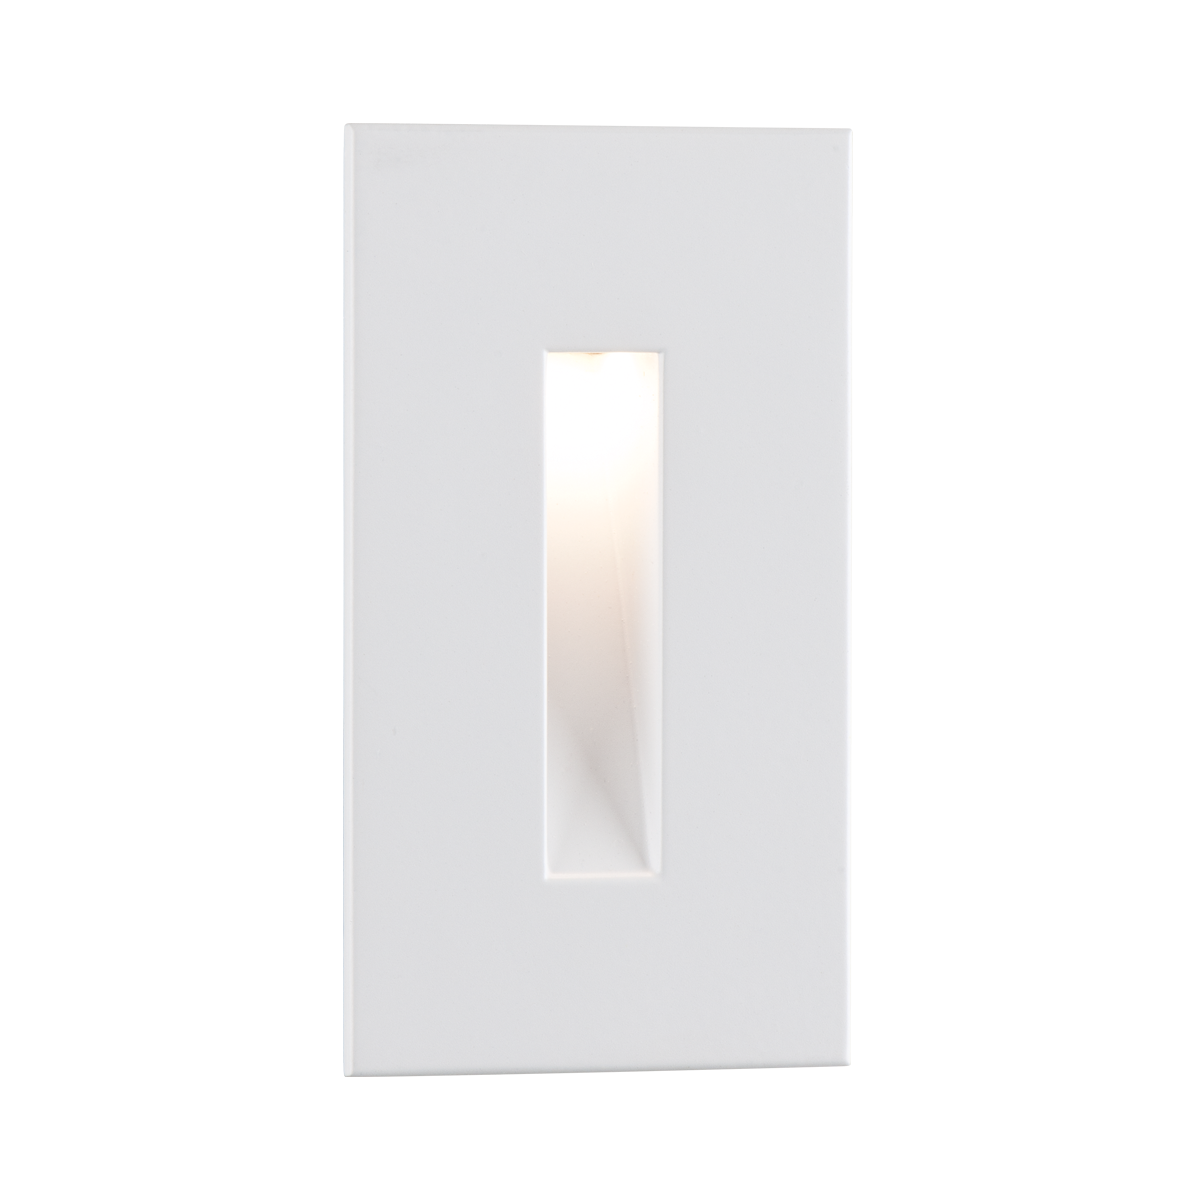 "4-1 - 2"" x 2-1 - 2"" LED Step Light, White Finish"